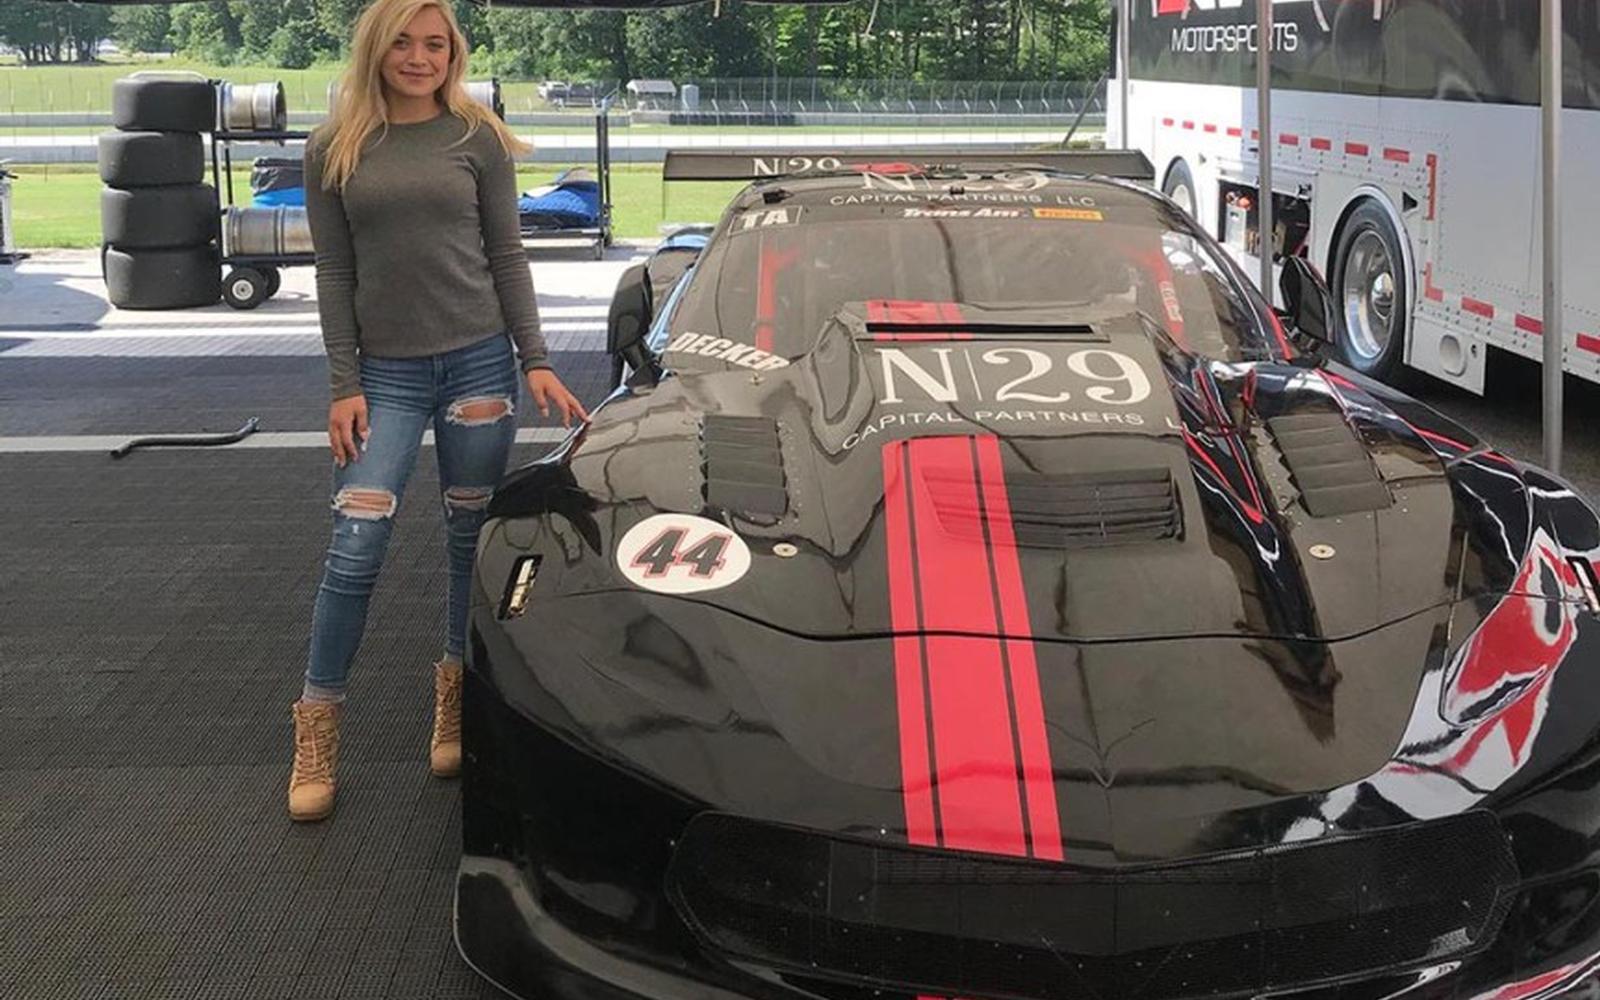 West Coast Corvette >> Natalie Decker Joines Trans Am at Road America